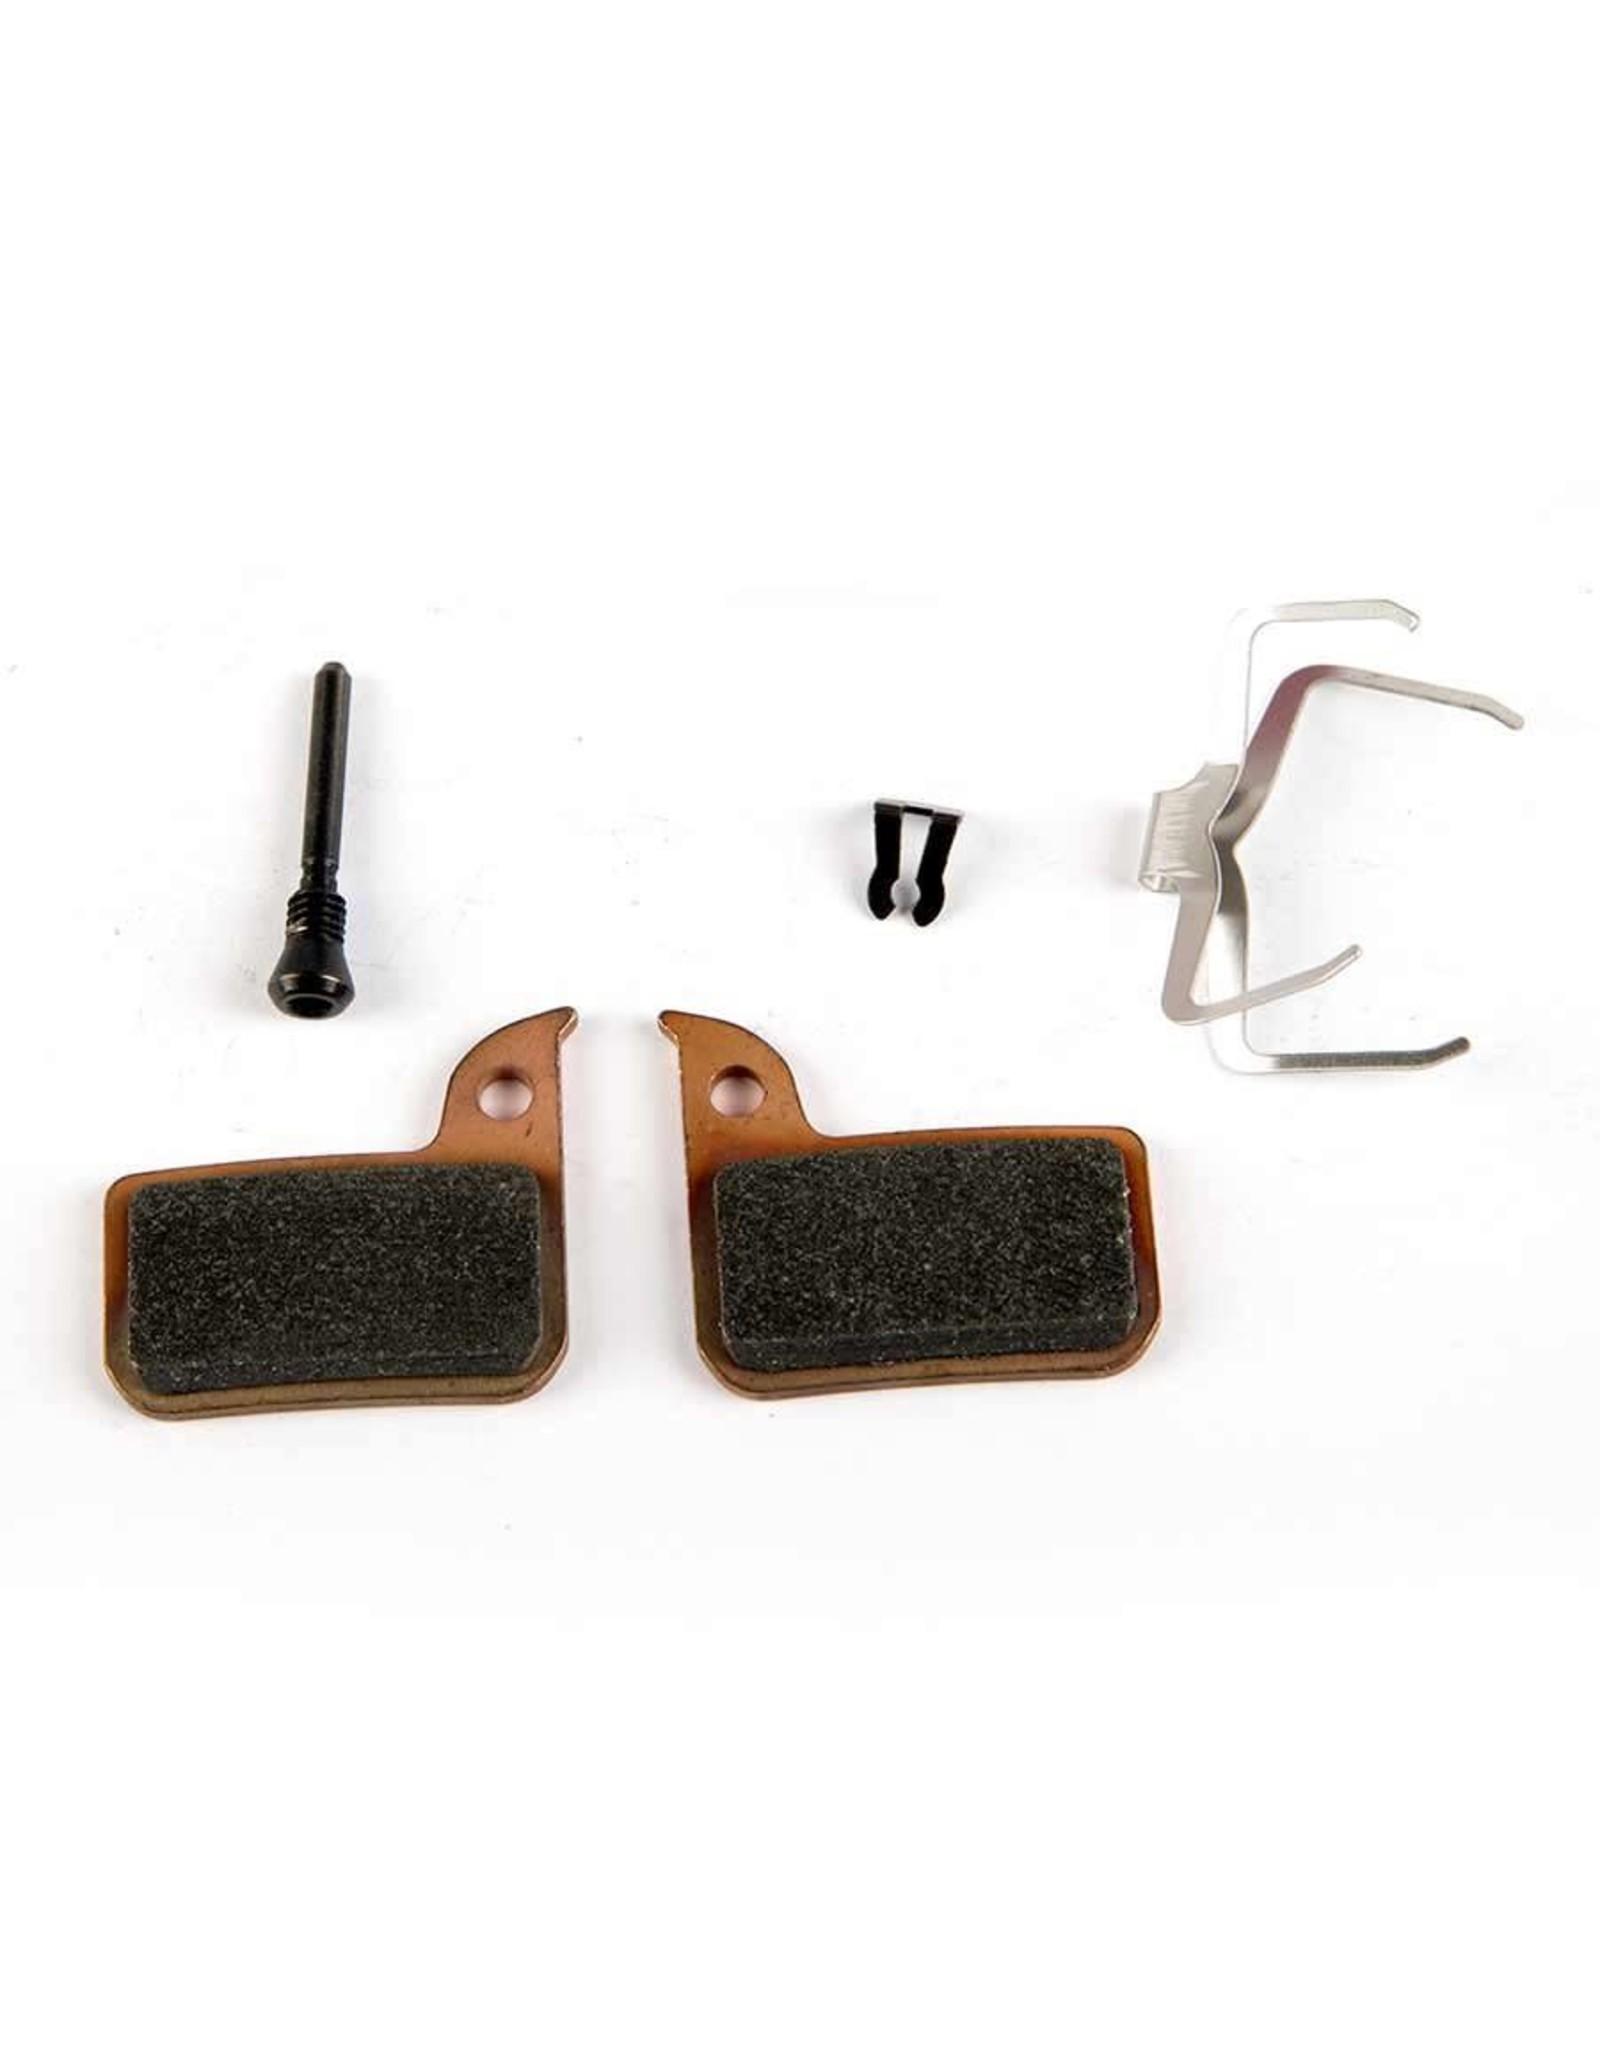 SRAM Sram, HRD, Level TLM, Level Ultimate, Disc brake pads, Organic/Steel plate, pair